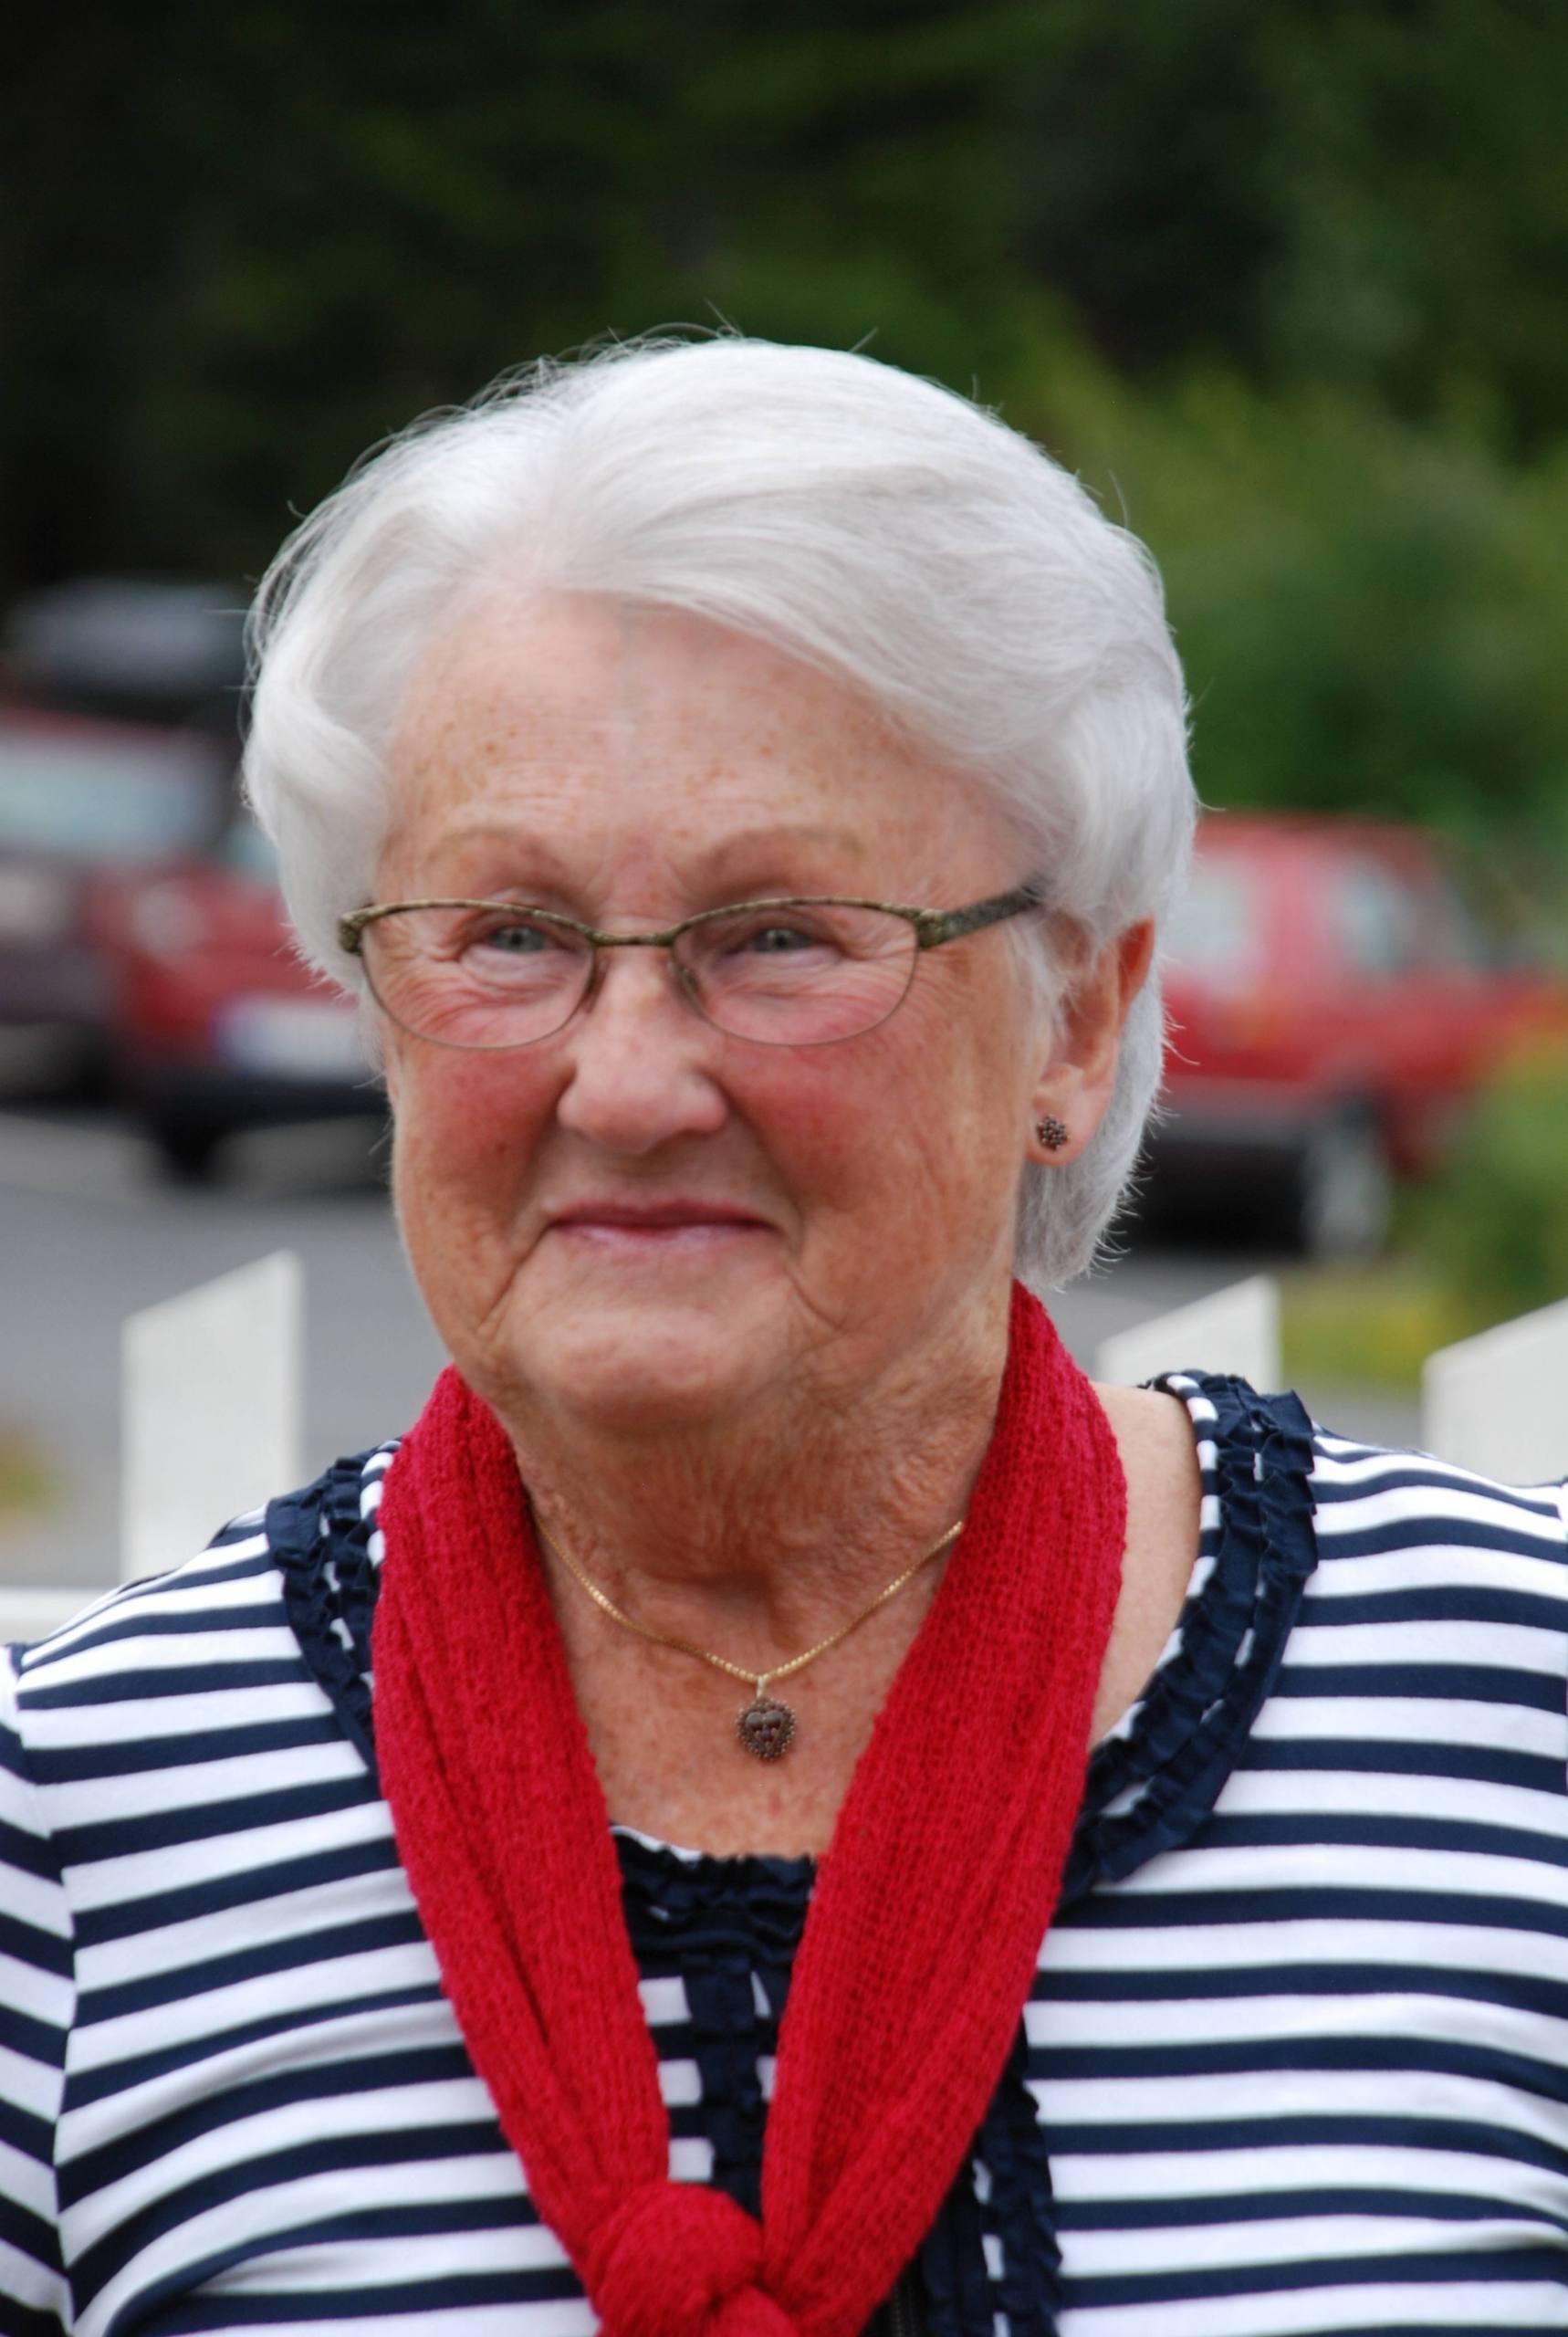 gamla mormor spruta